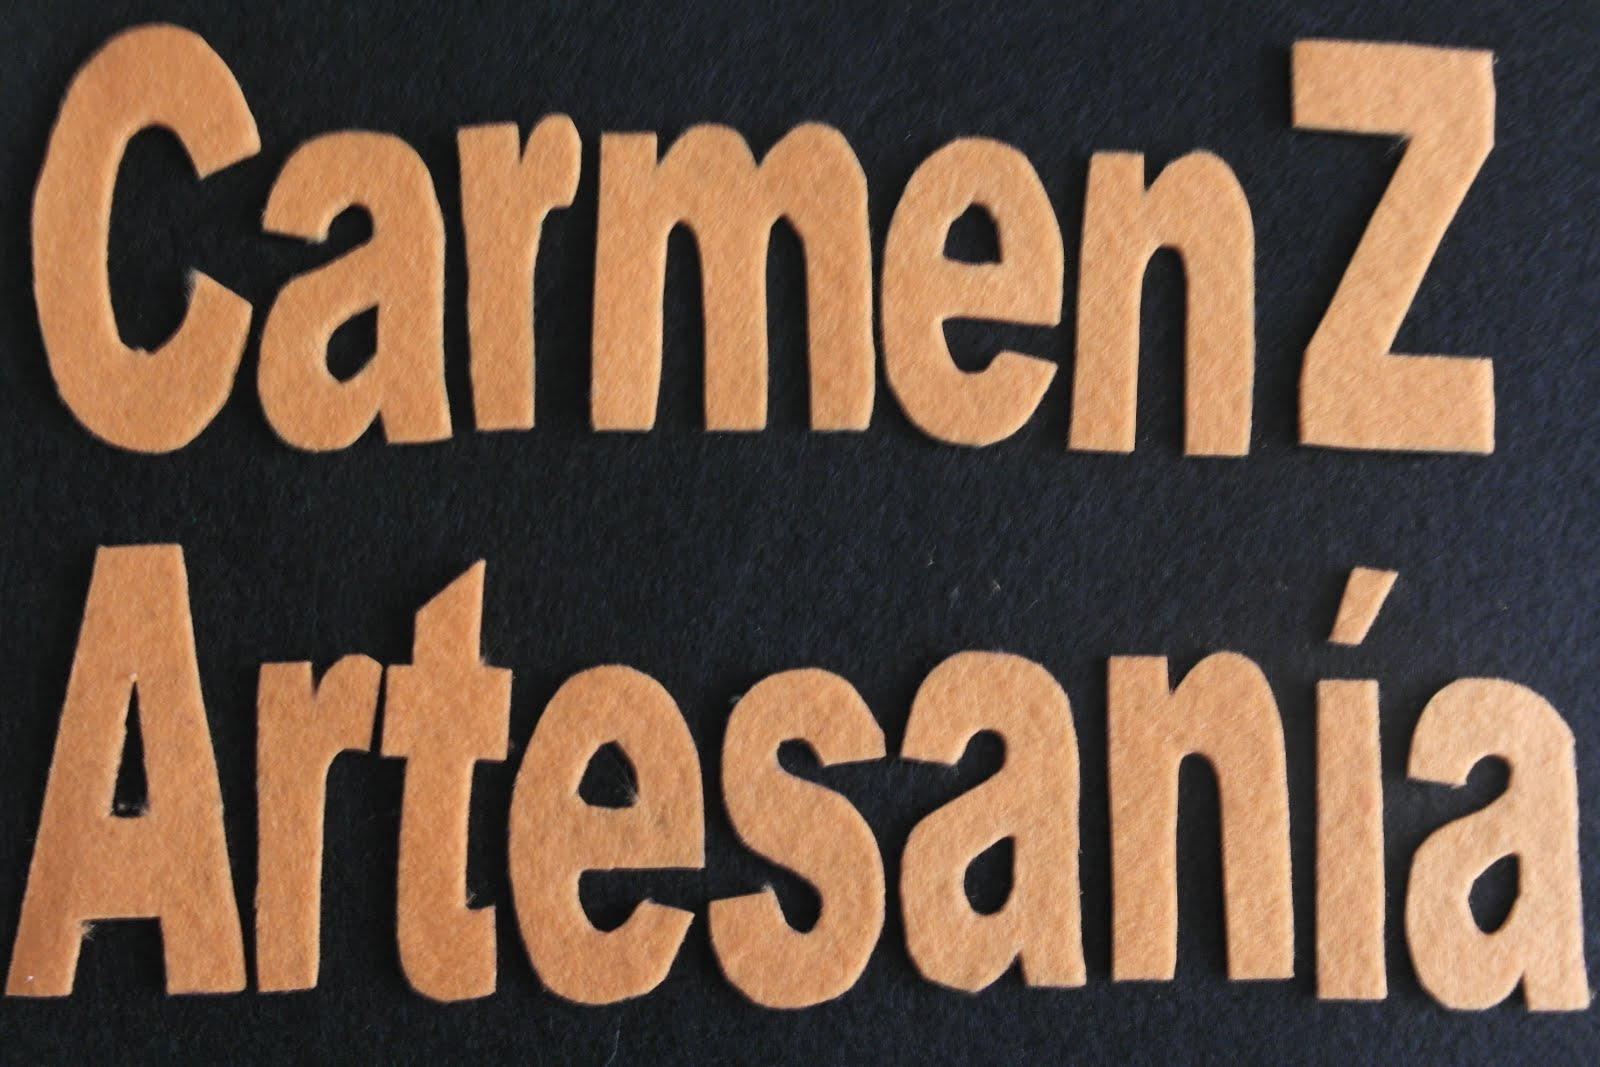 CarmenZ Artesania